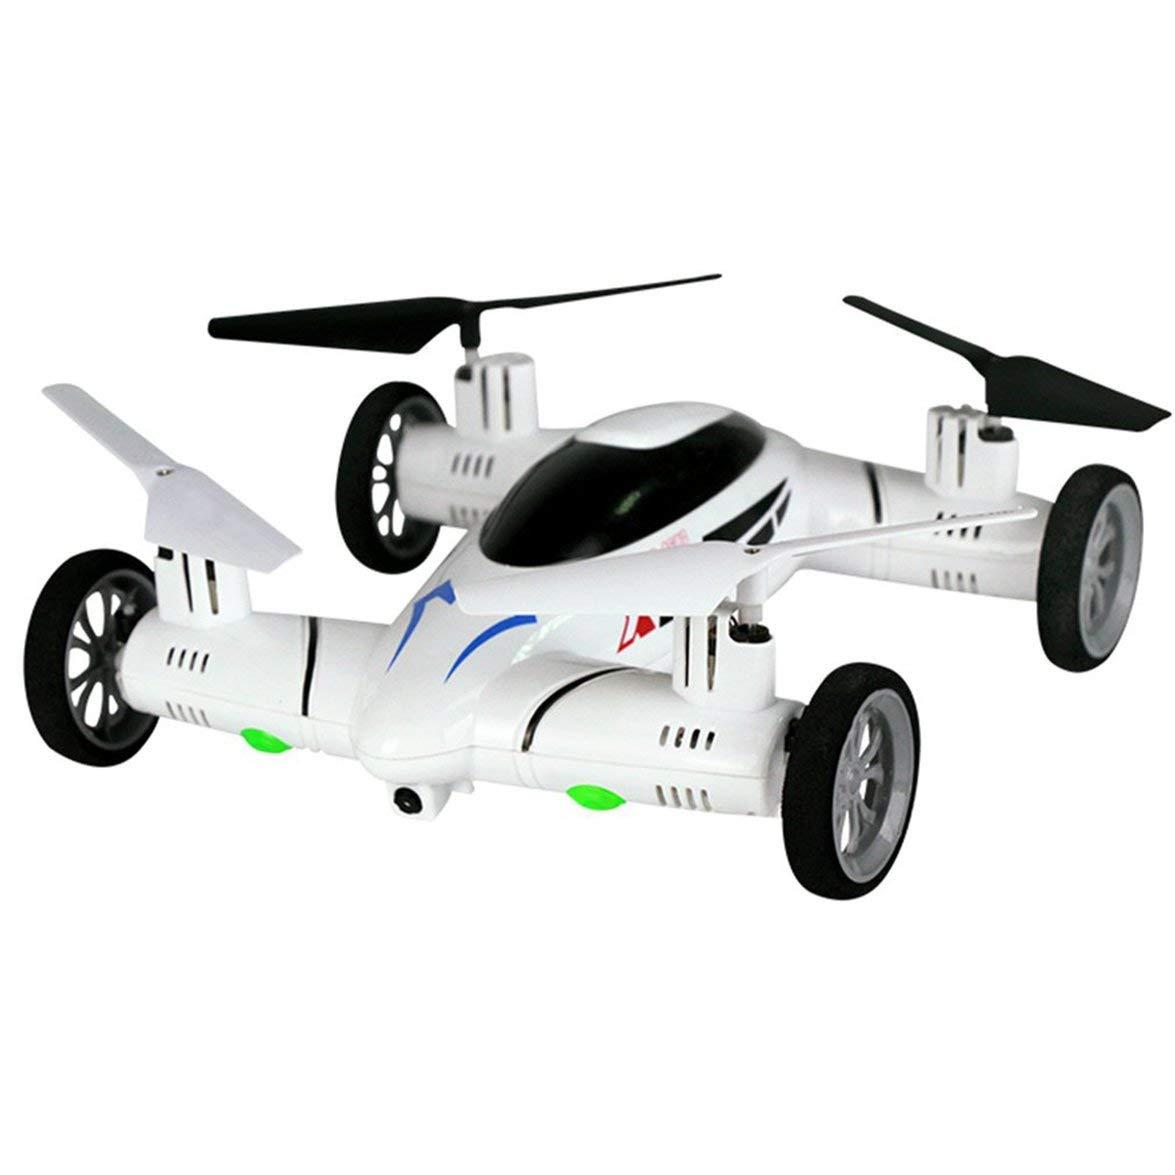 Kongqiabona X25 720P HD HD HD Kamera Smart RC Fliegen Auto Drone Quadcopter Flugzeuge UAV mit 360 掳 Flips Altitude Hold 0ne Key Return, 46451c